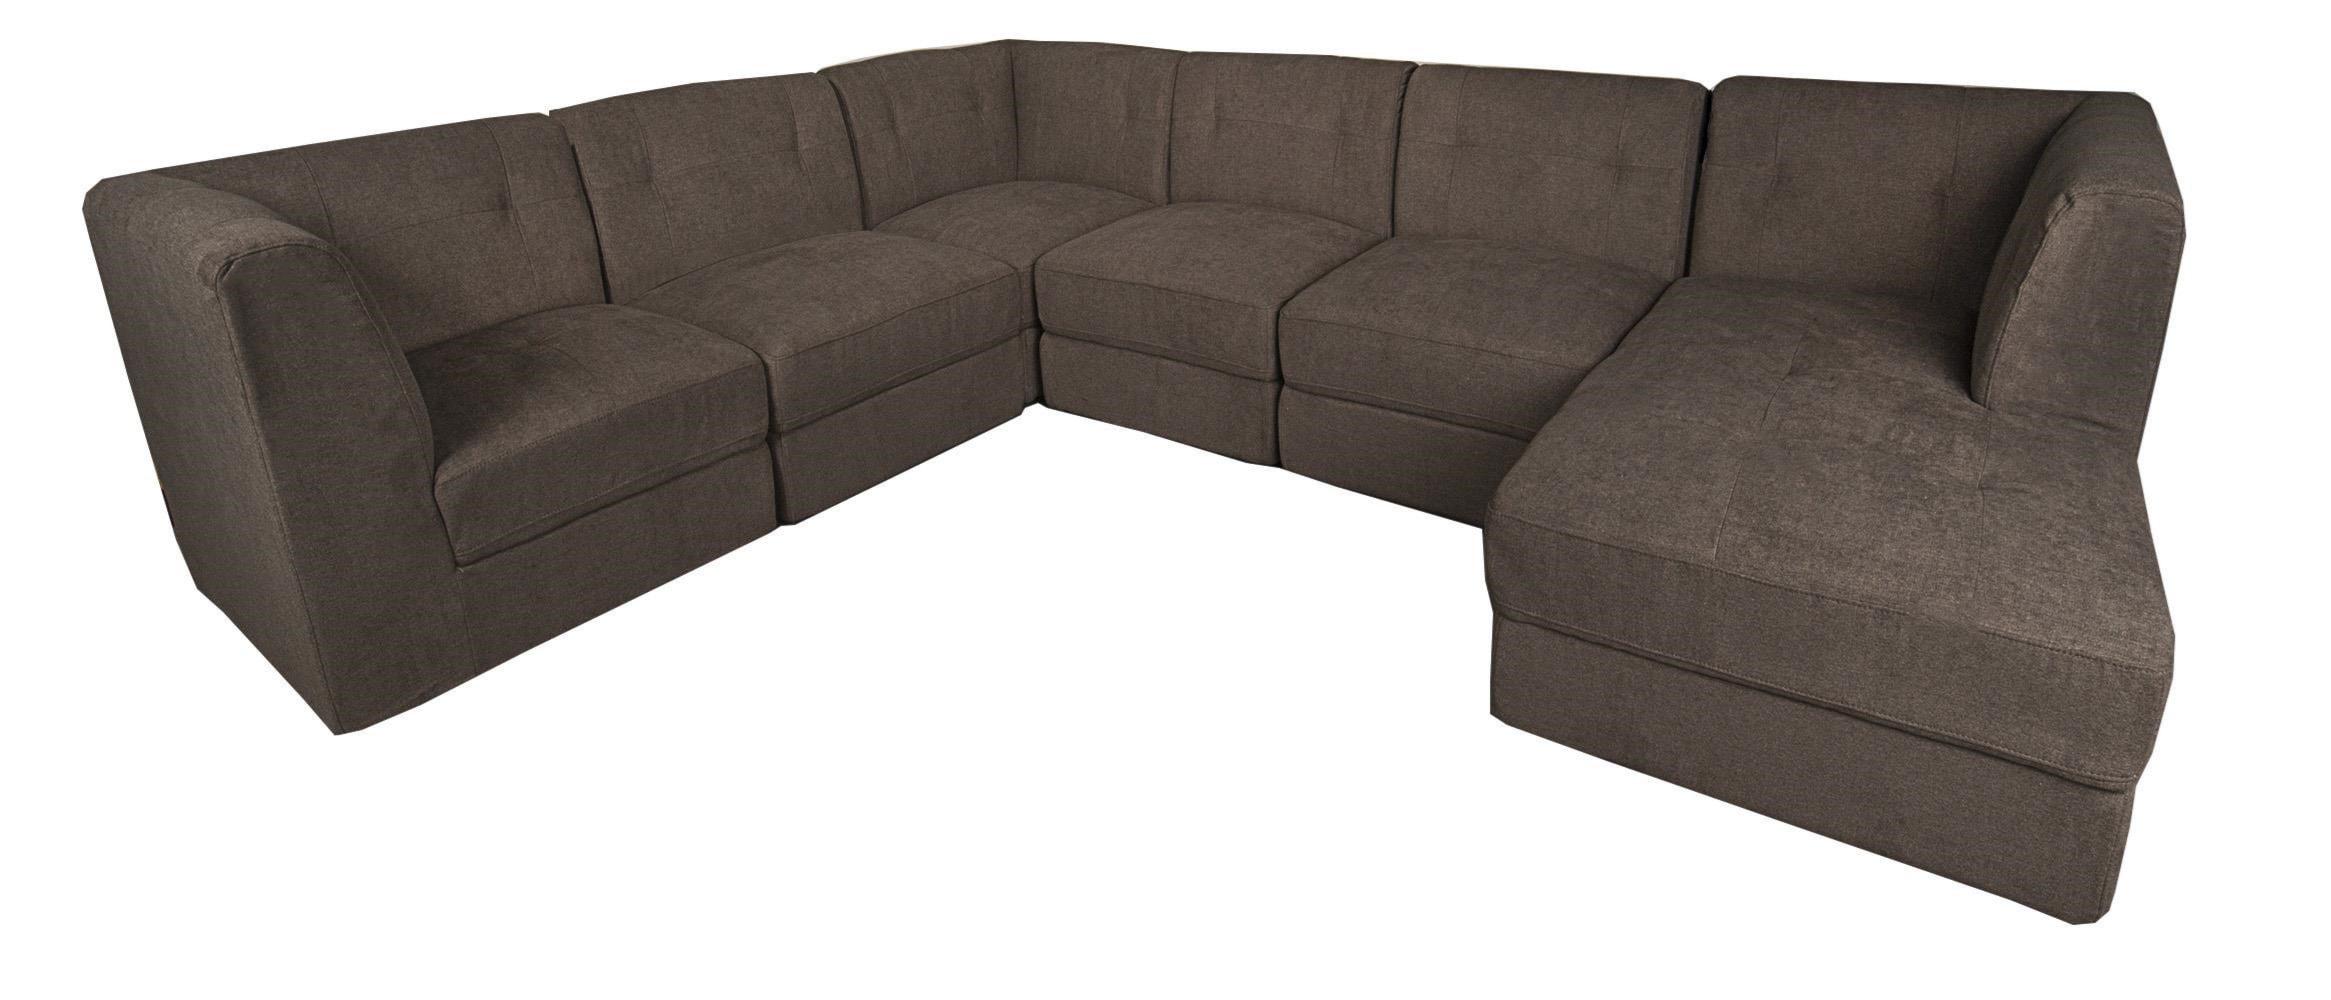 modern sectional sofa. Morris Home LuxLux Sectional Sofa Modern Sectional Sofa O